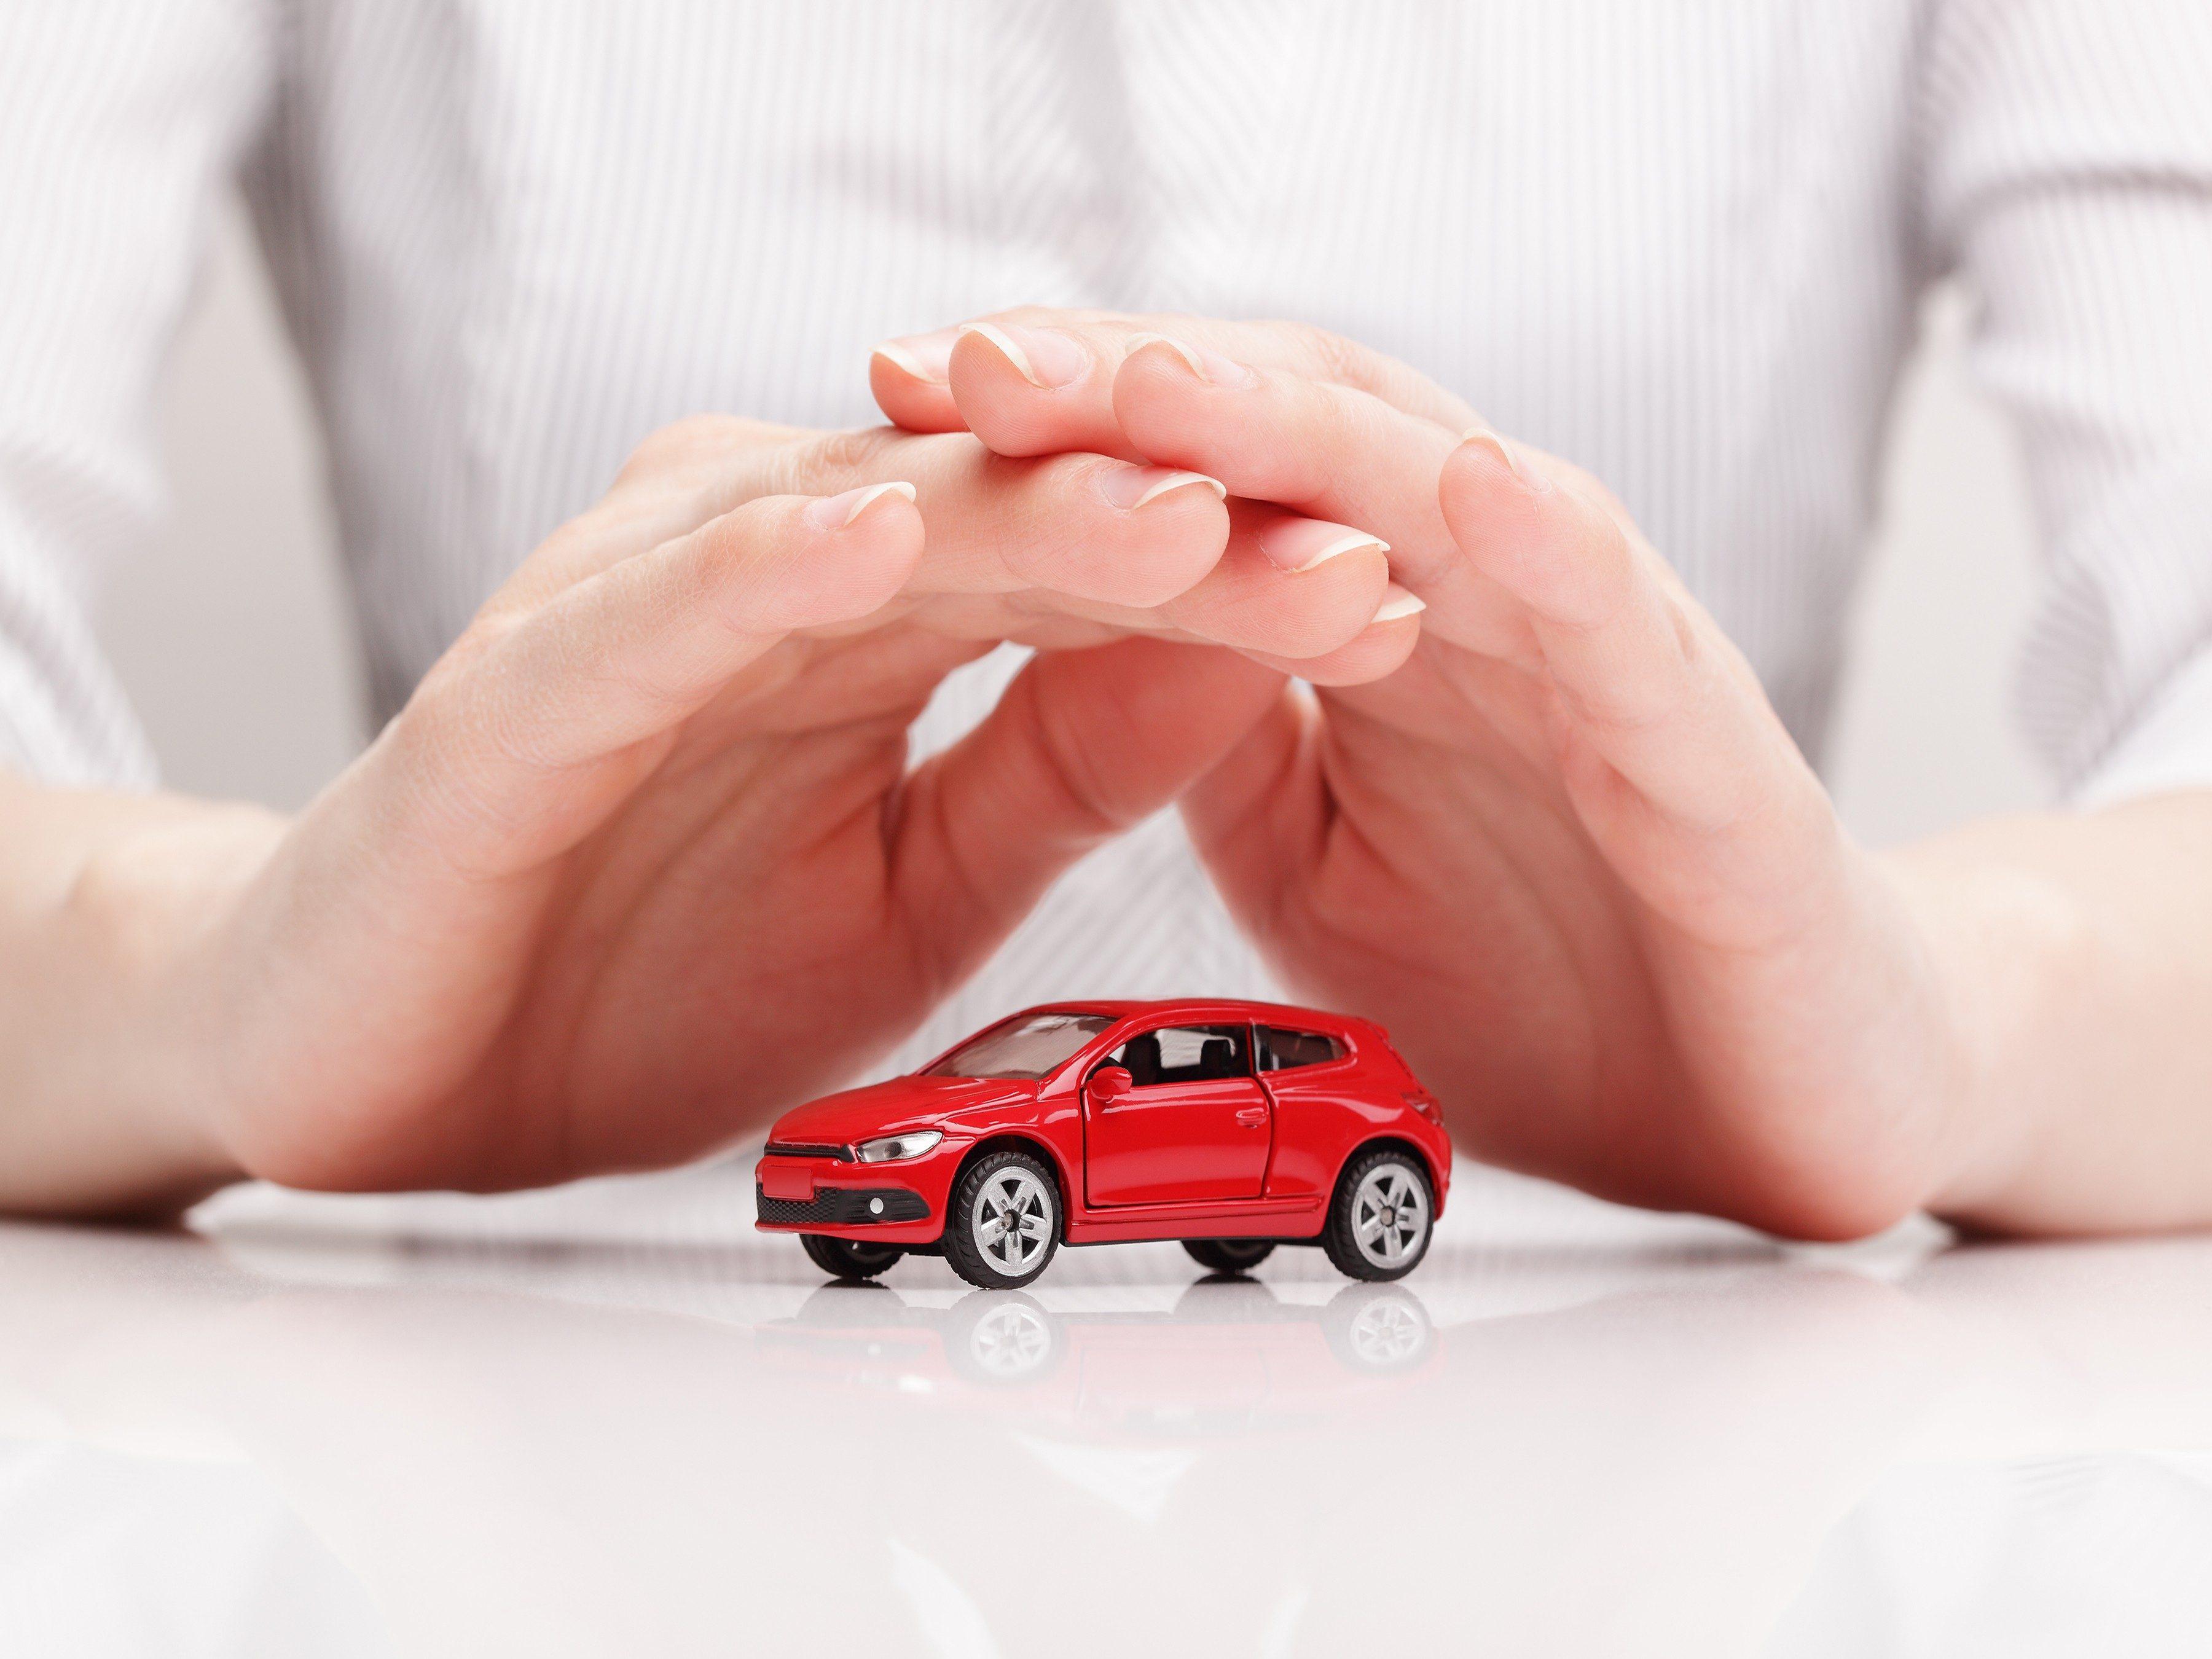 4. Minimum car insurance coverage may not be enough.